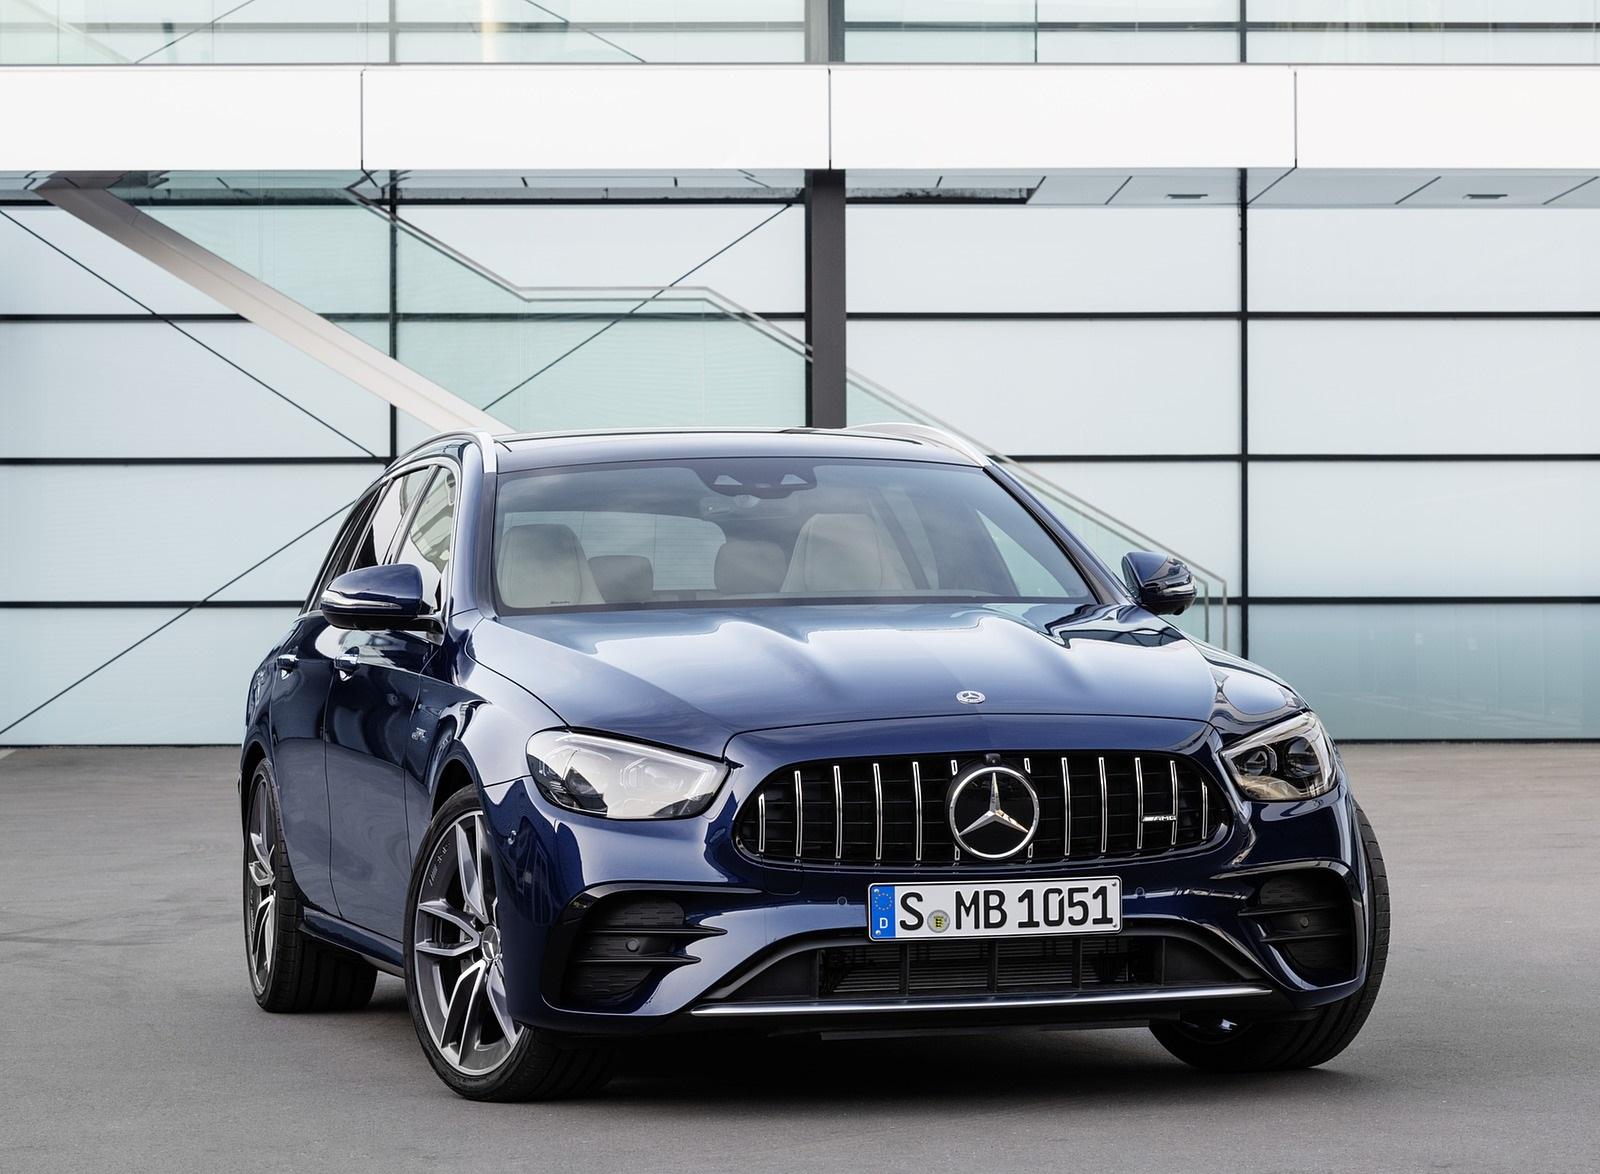 2021 Mercedes-AMG E 53 Estate 4MATIC+ T-Model (Color: Cavansite Blue Metallic) Front Wallpapers (8)